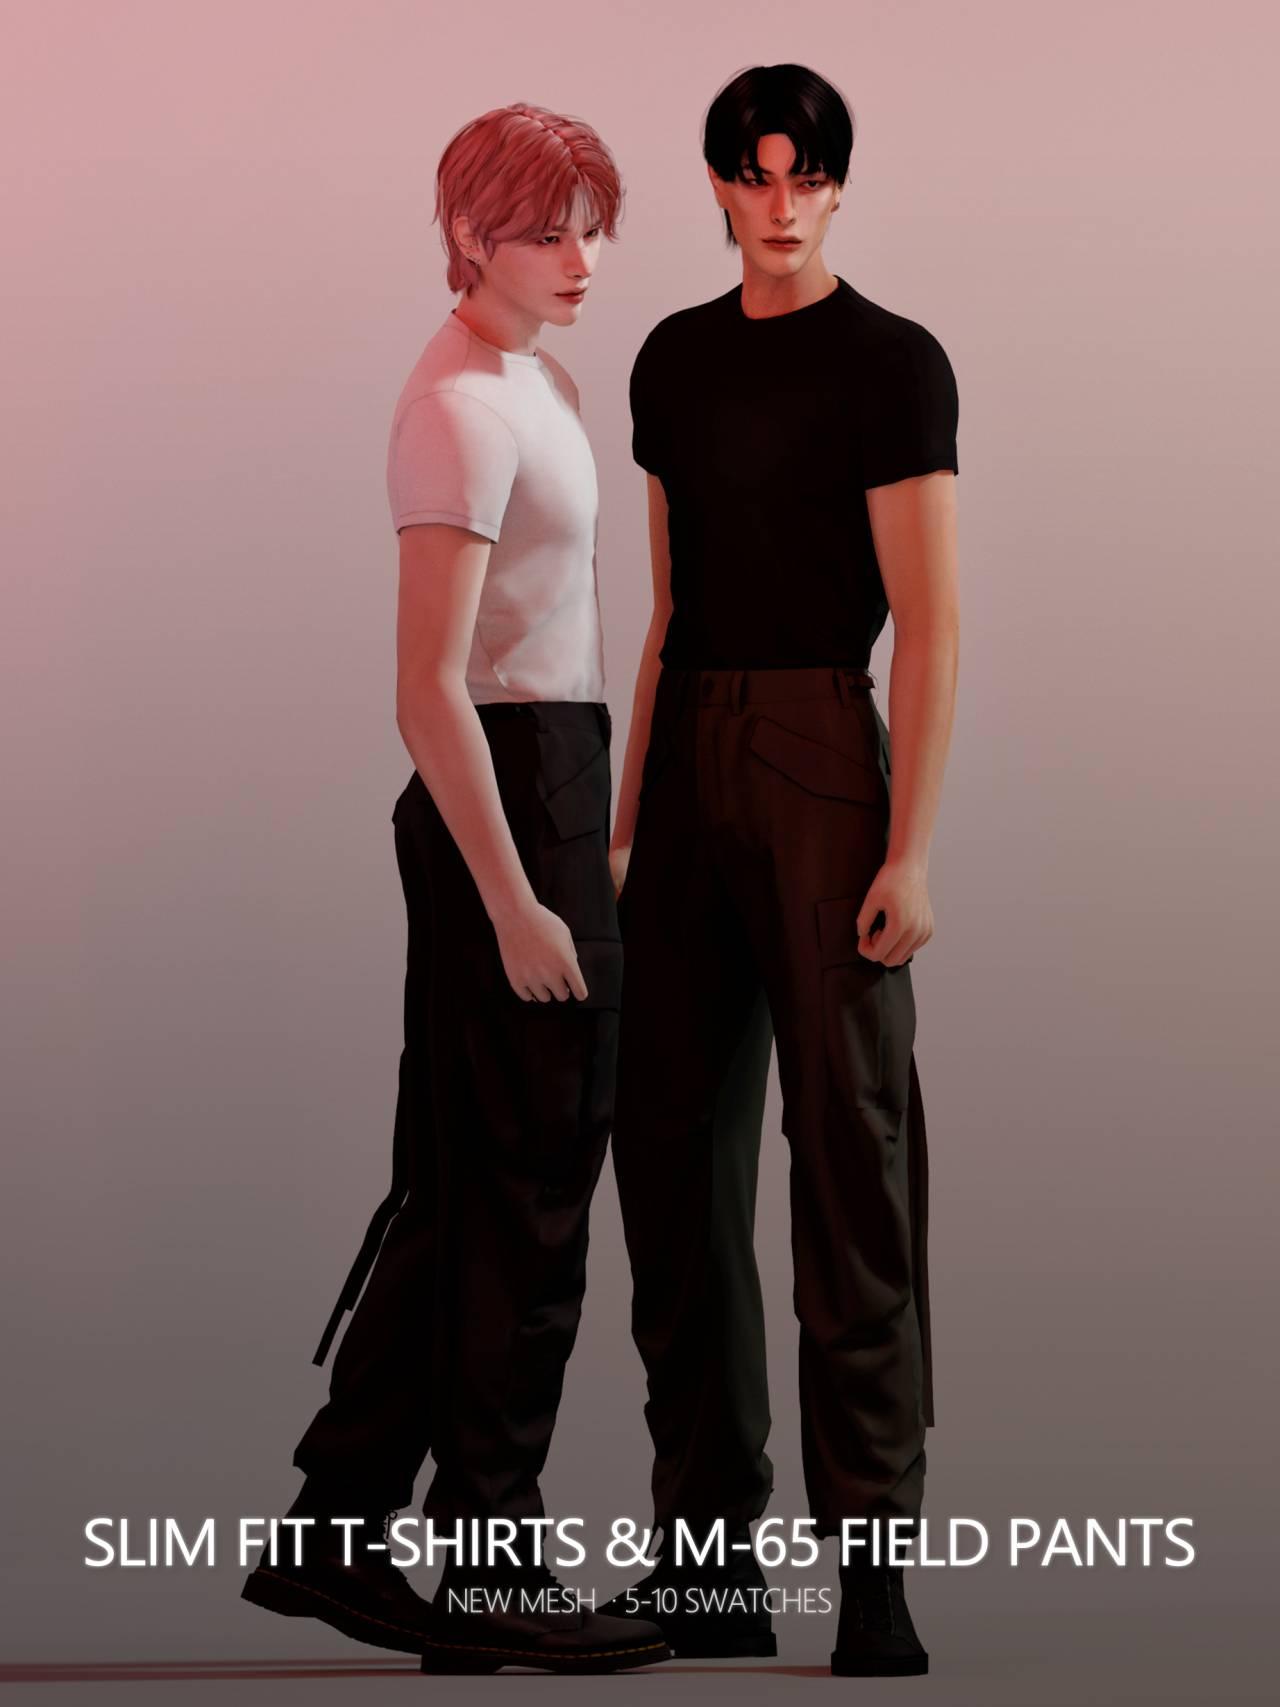 Футболка и штаны - Slim Fit T-Shirts M-65 Field Pants